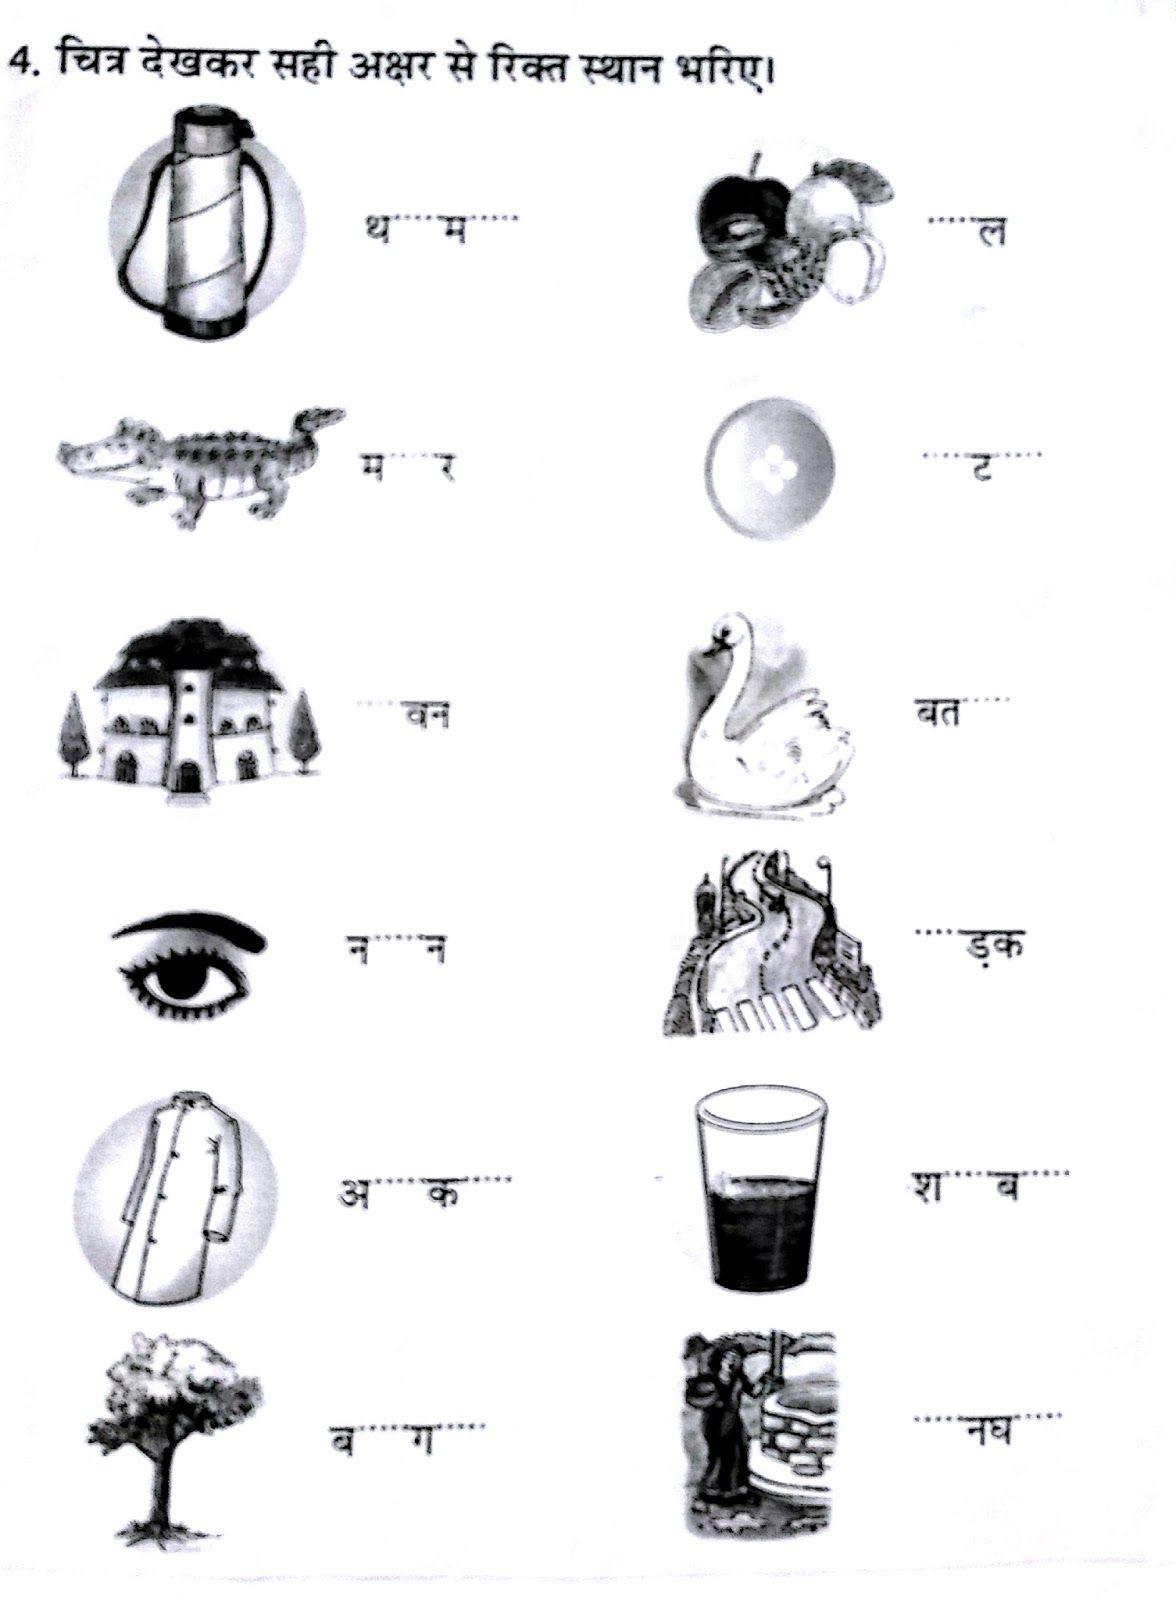 Page 9 Jpg 1176 1600 Hindi Worksheets Hindi Alphabet Hindi Language Learning [ 1600 x 1176 Pixel ]